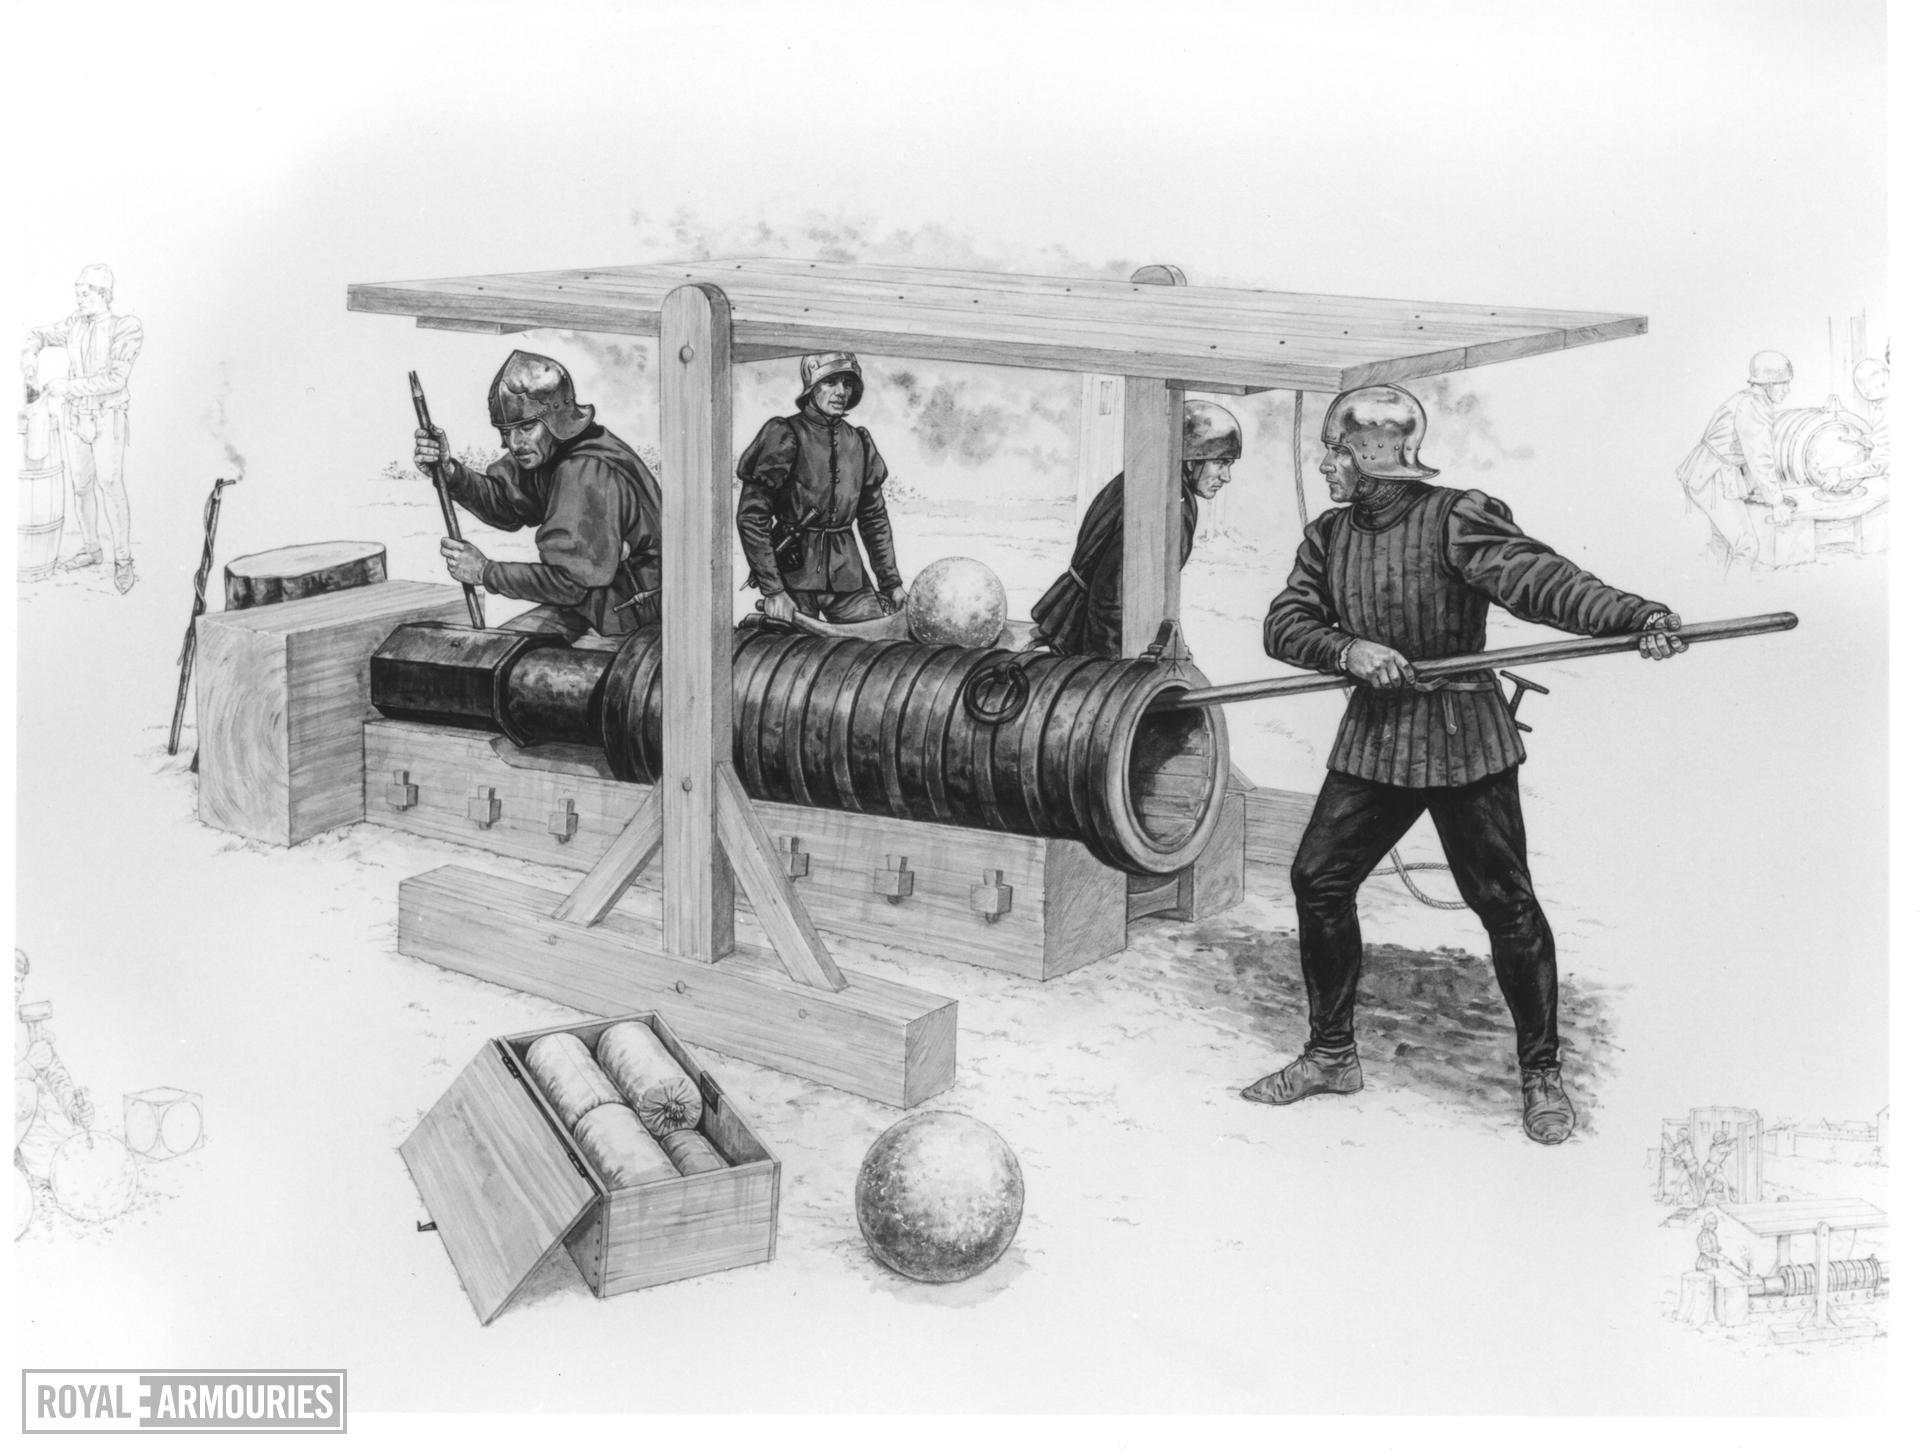 Flintlock muzzle-loading military musket - Lawrence Pattern